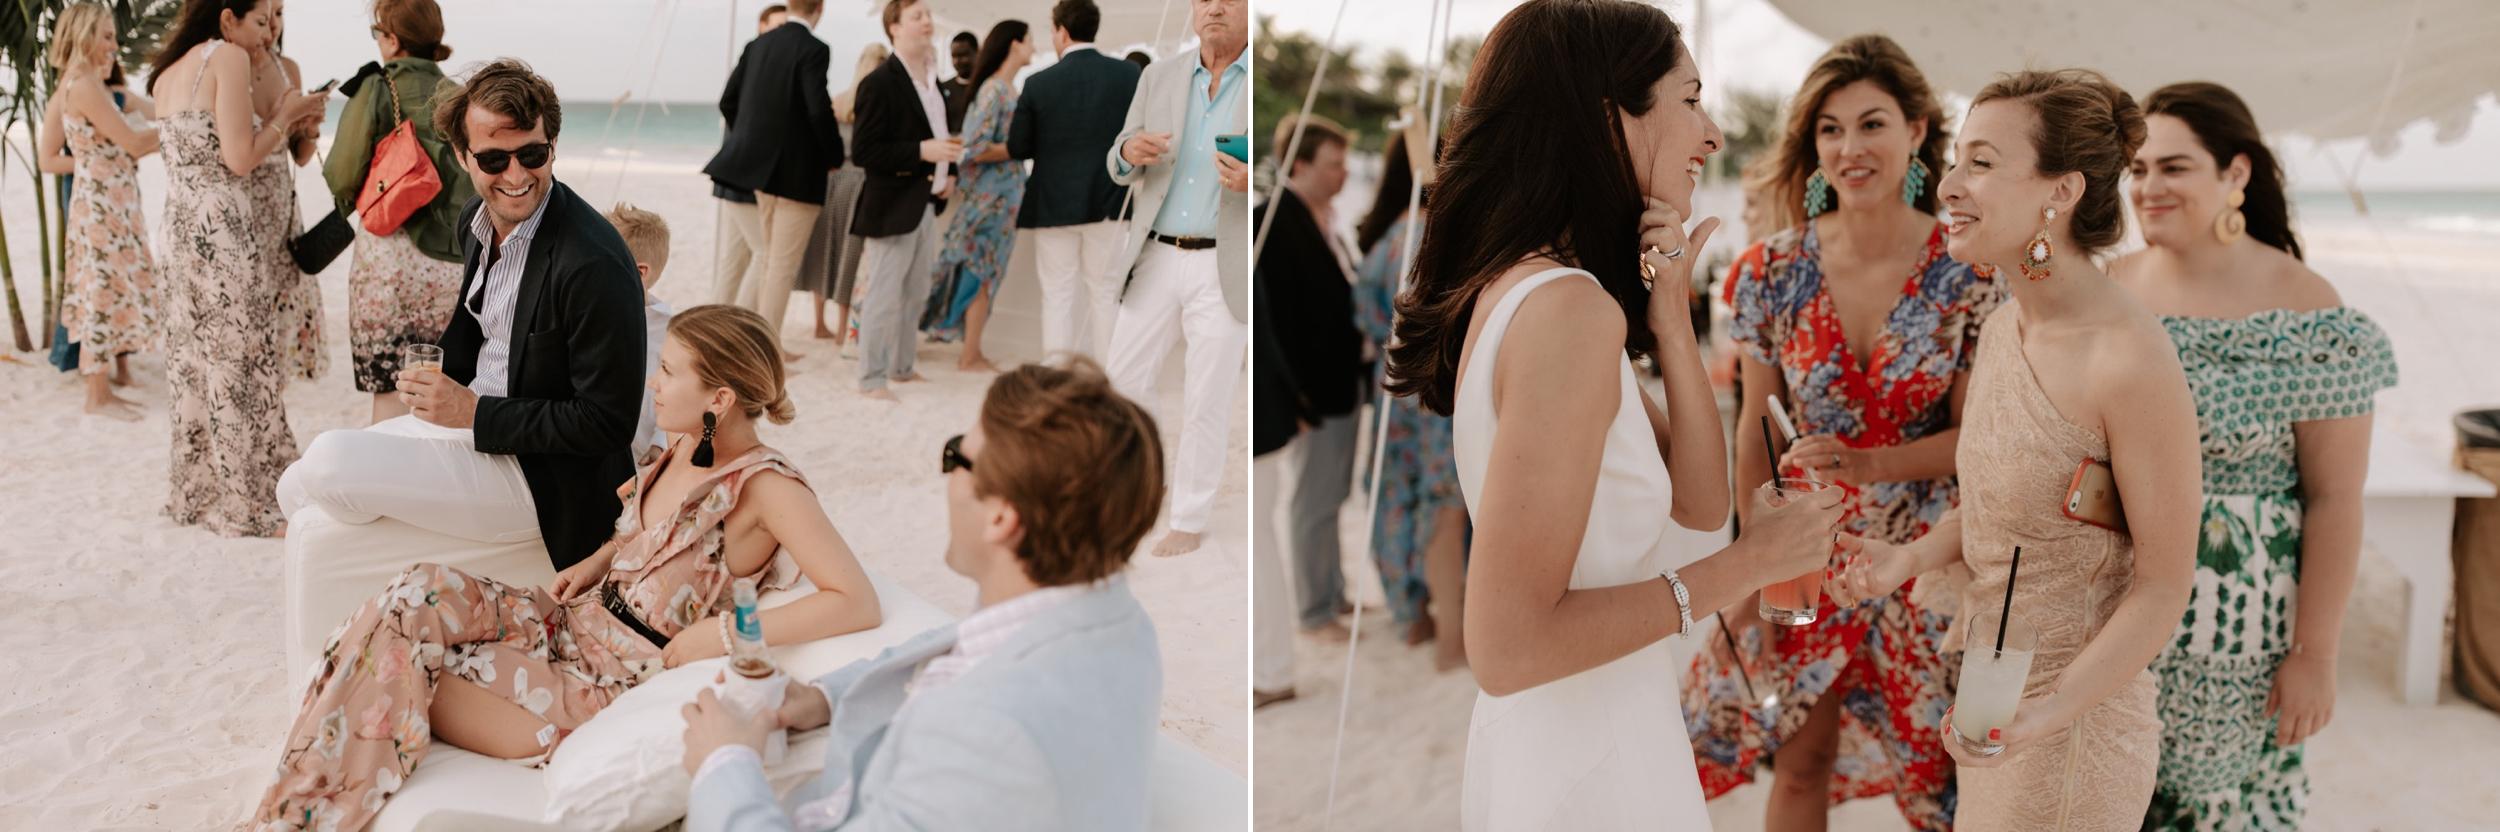 Harbour-Island-Ocean-View-Club-Wedding-Photographer_67.jpg